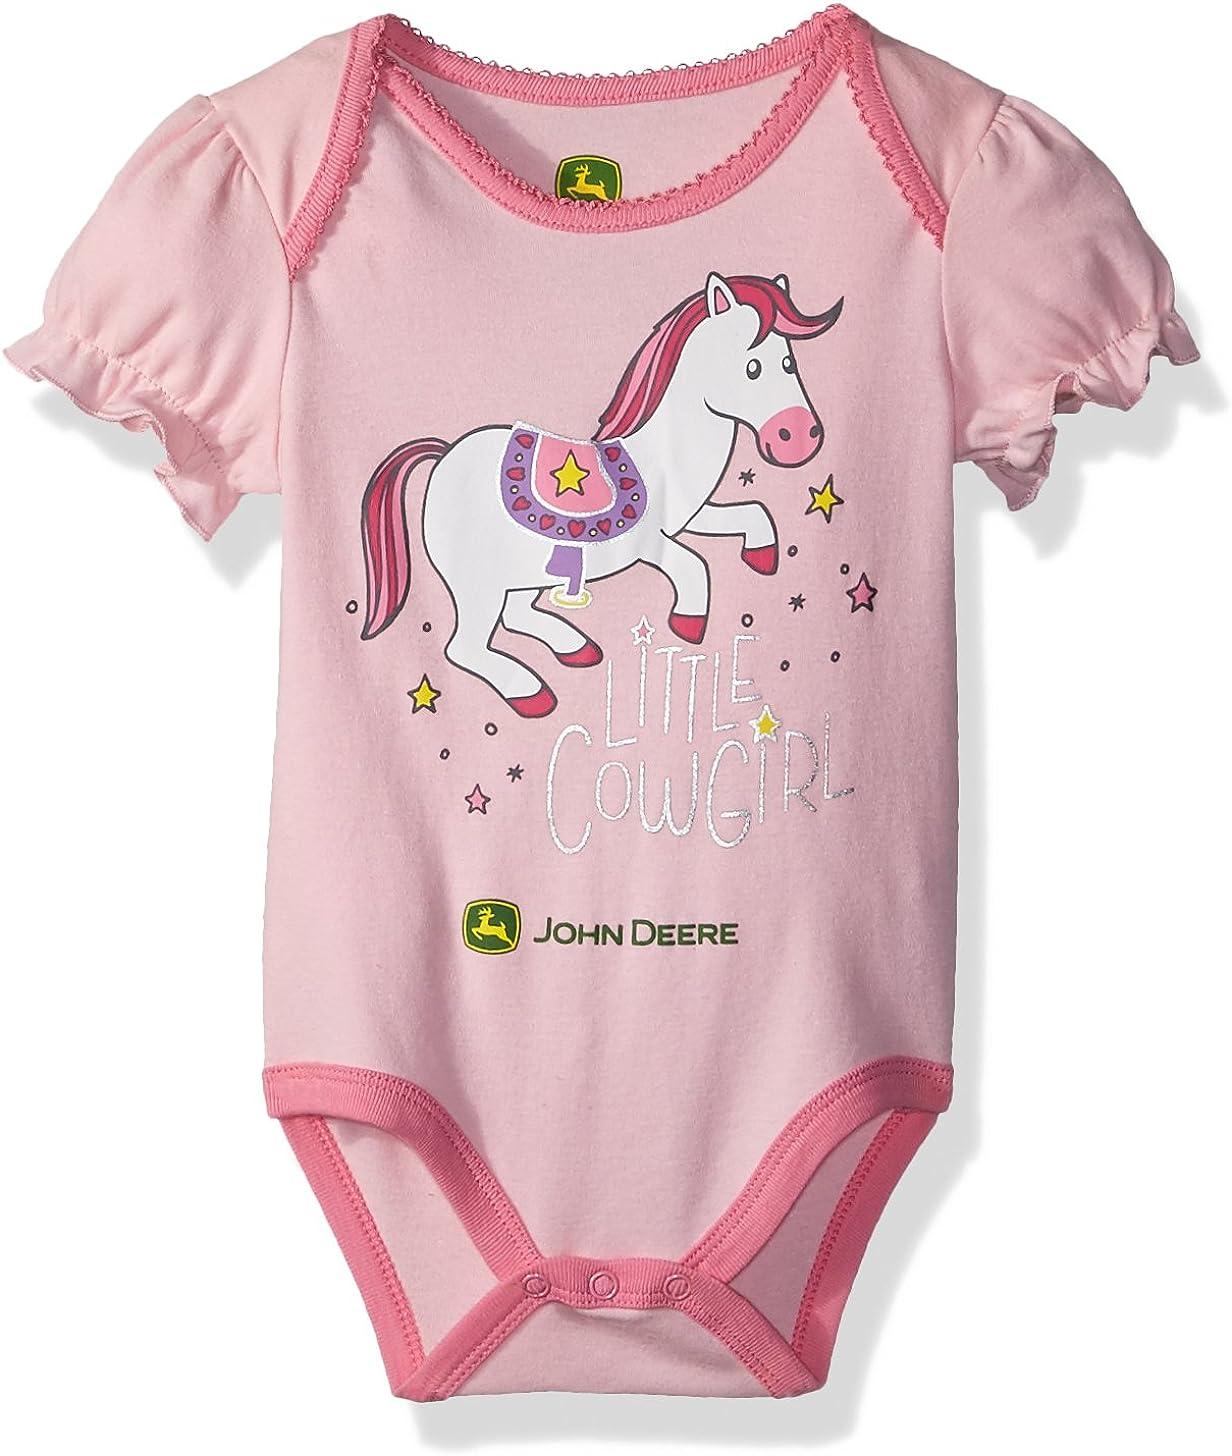 John Deere Baby-Girls Girl Bodyshirt Shirt